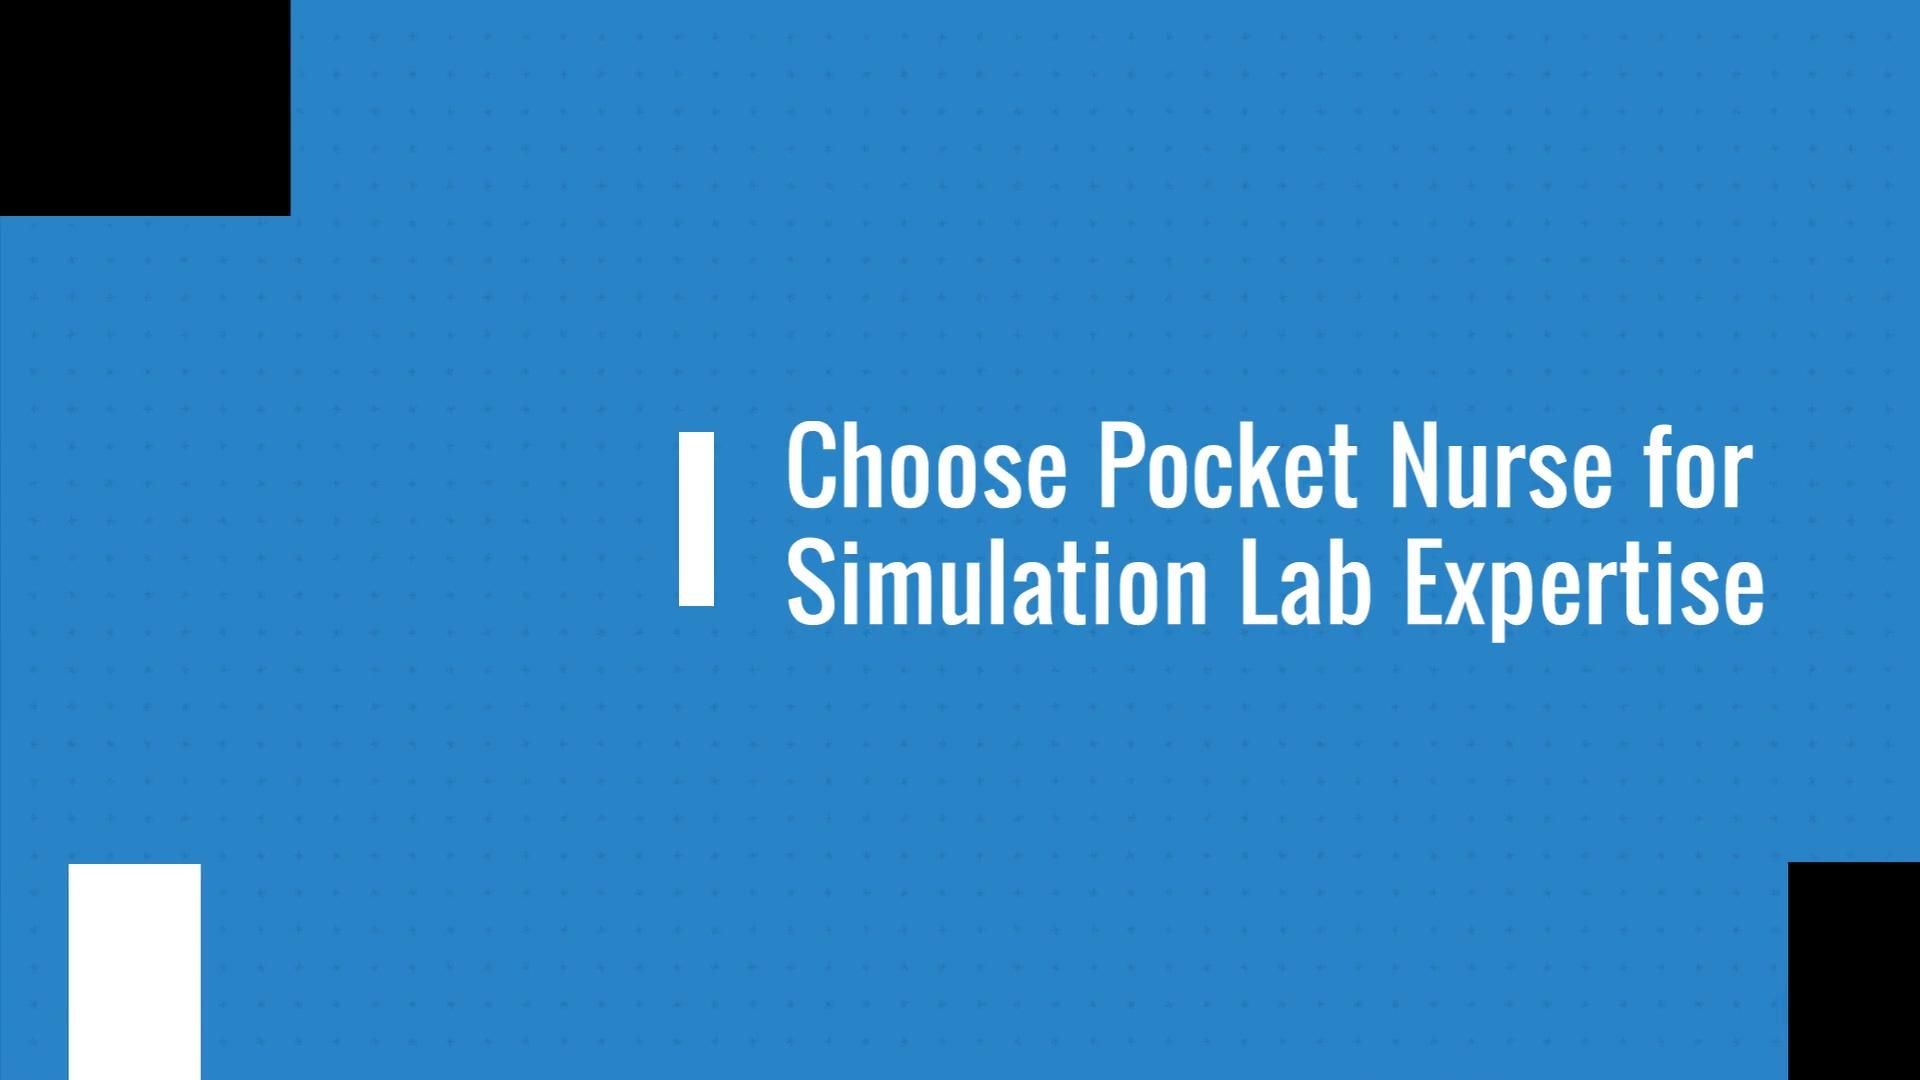 vi-sim-lab-expertise_10-2019 (3)